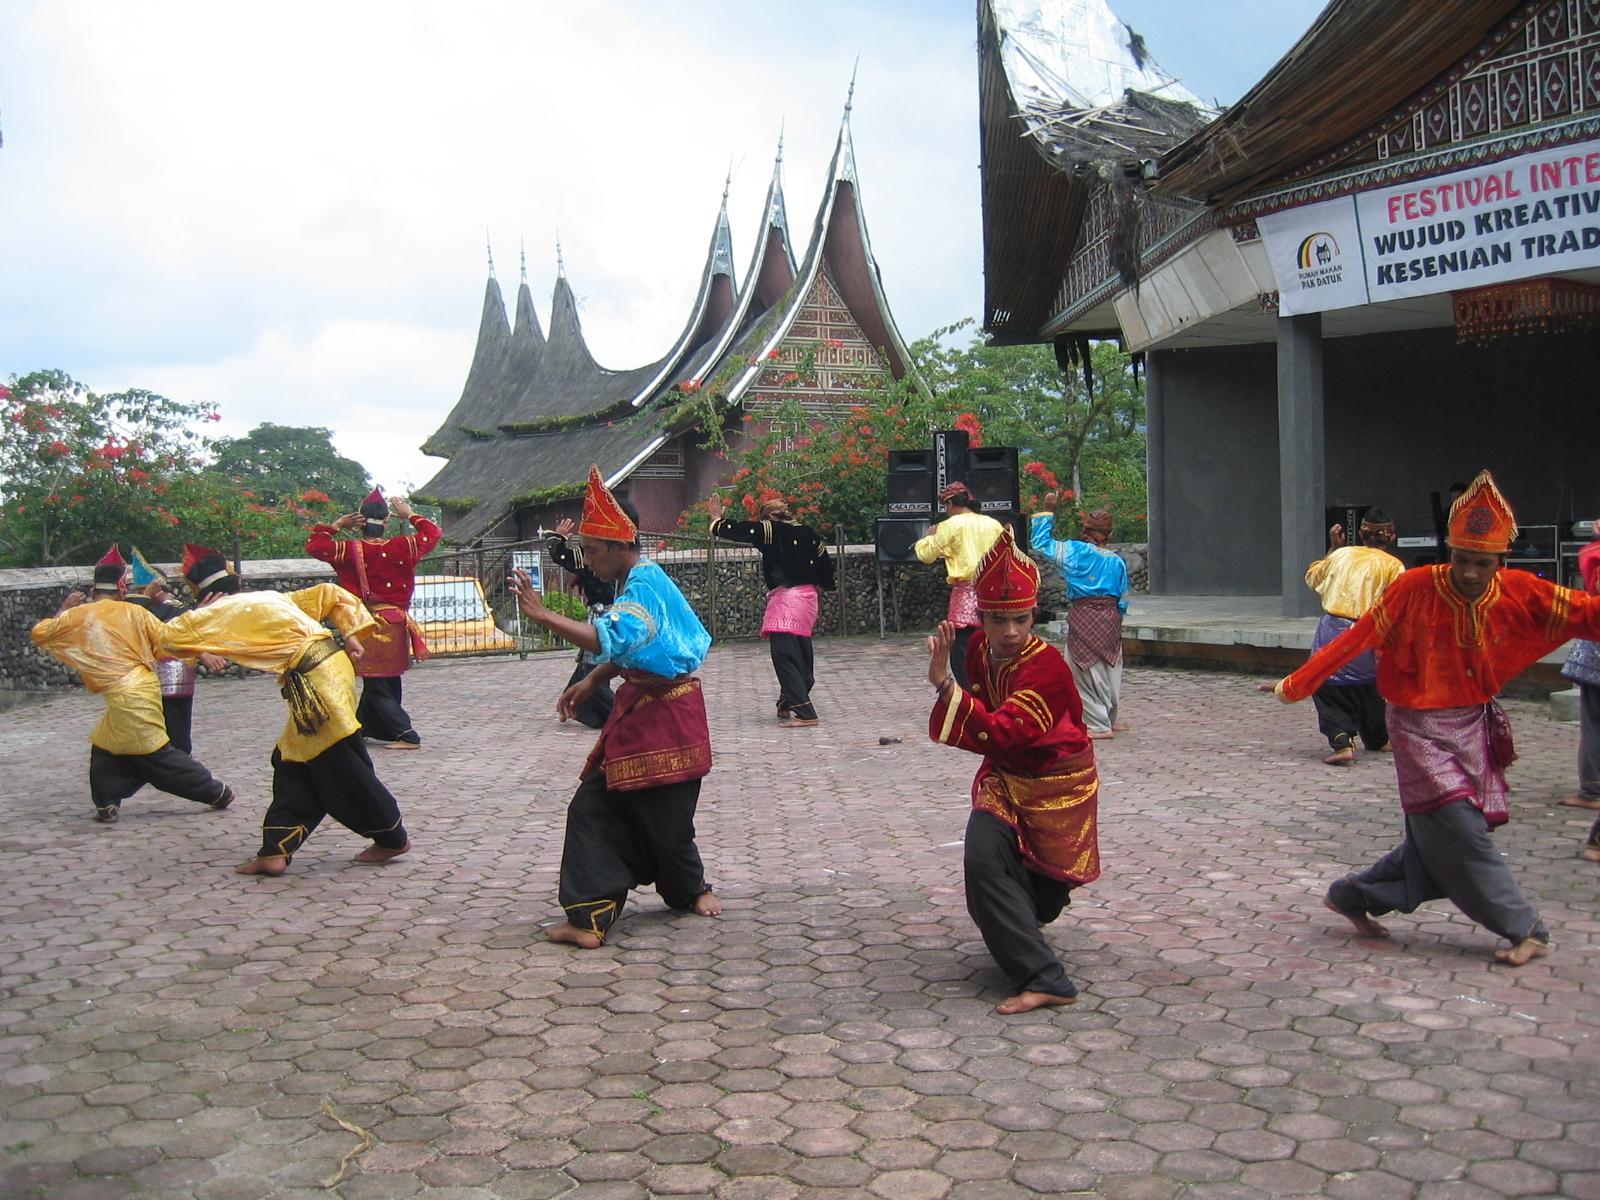 File:Randai Padang Panjang.jpg - Wikimedia Commons